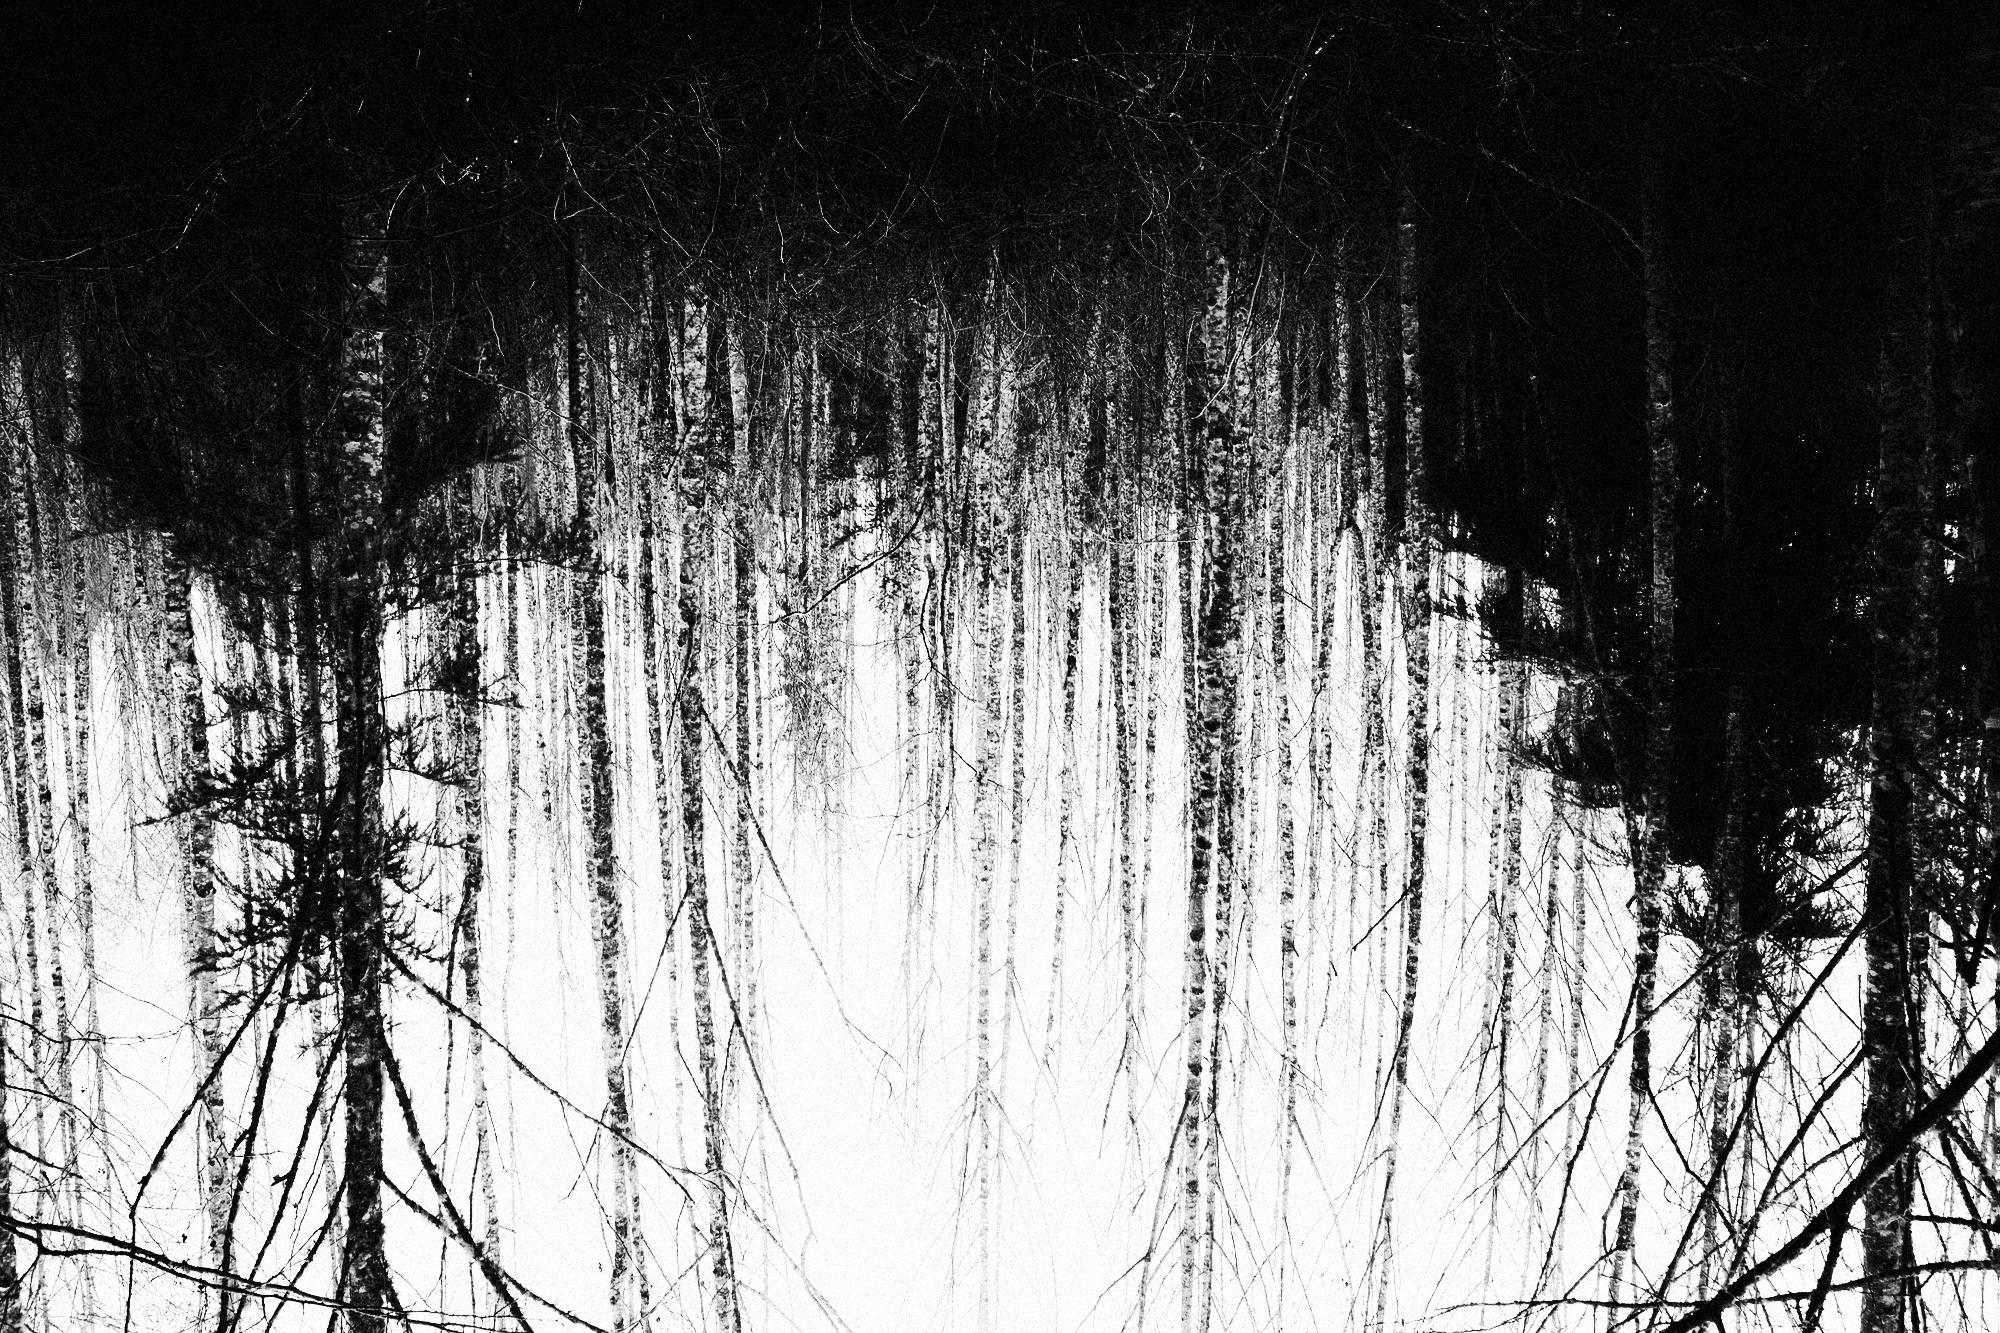 Port Gamble, WA, trees, b&w